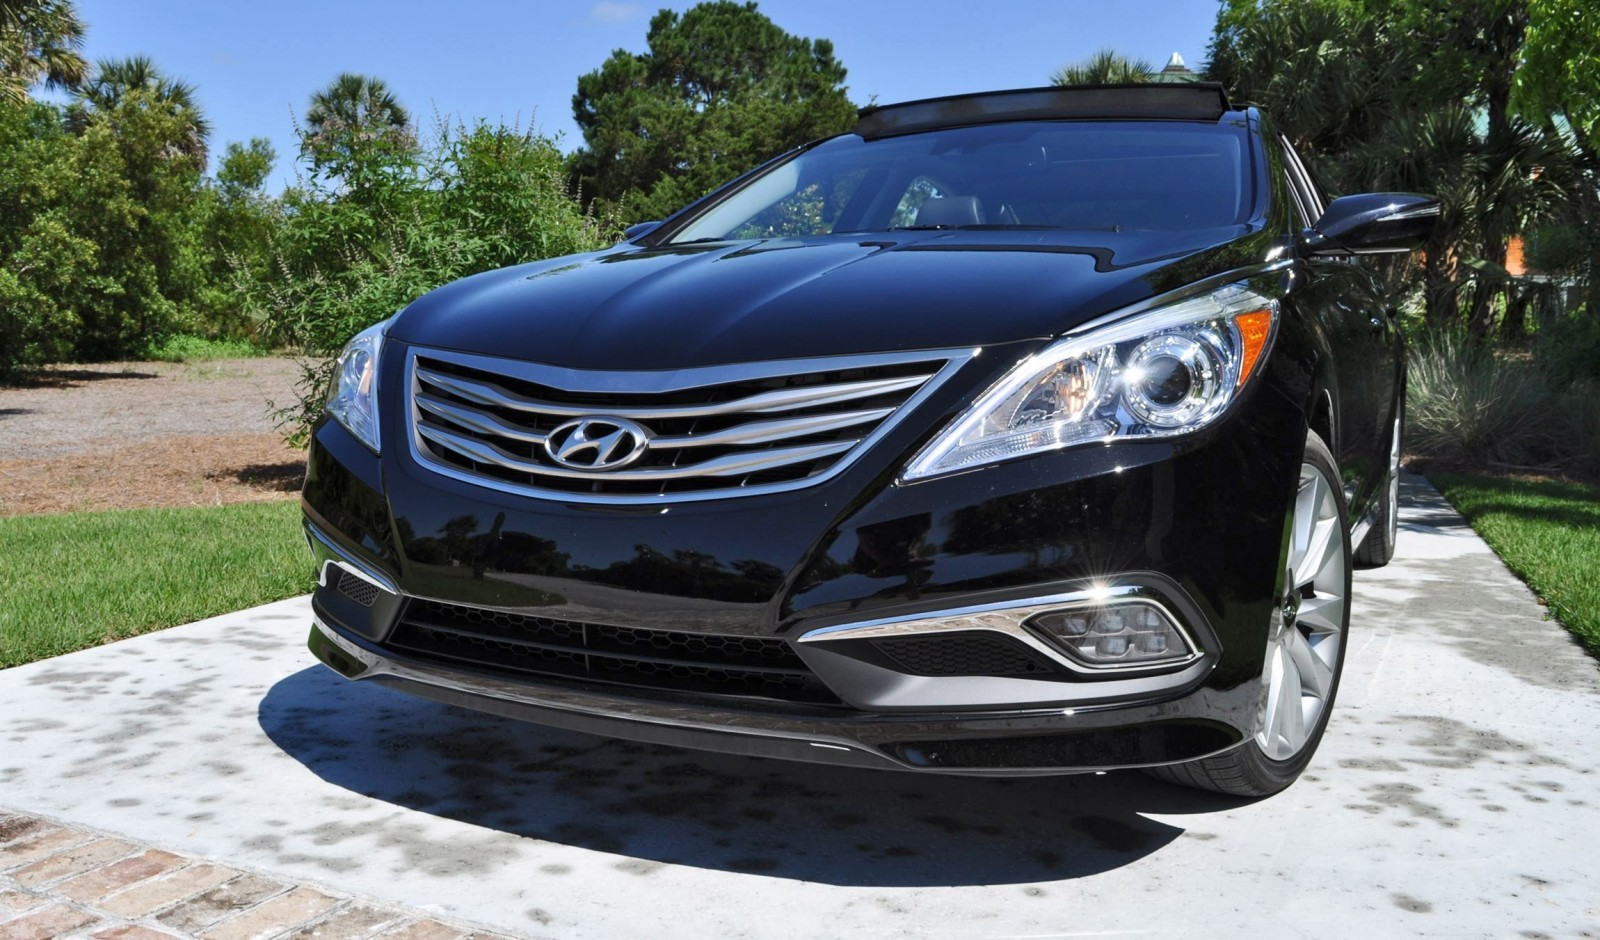 Road Test Review - 2015 Hyundai AZERA Limited 77